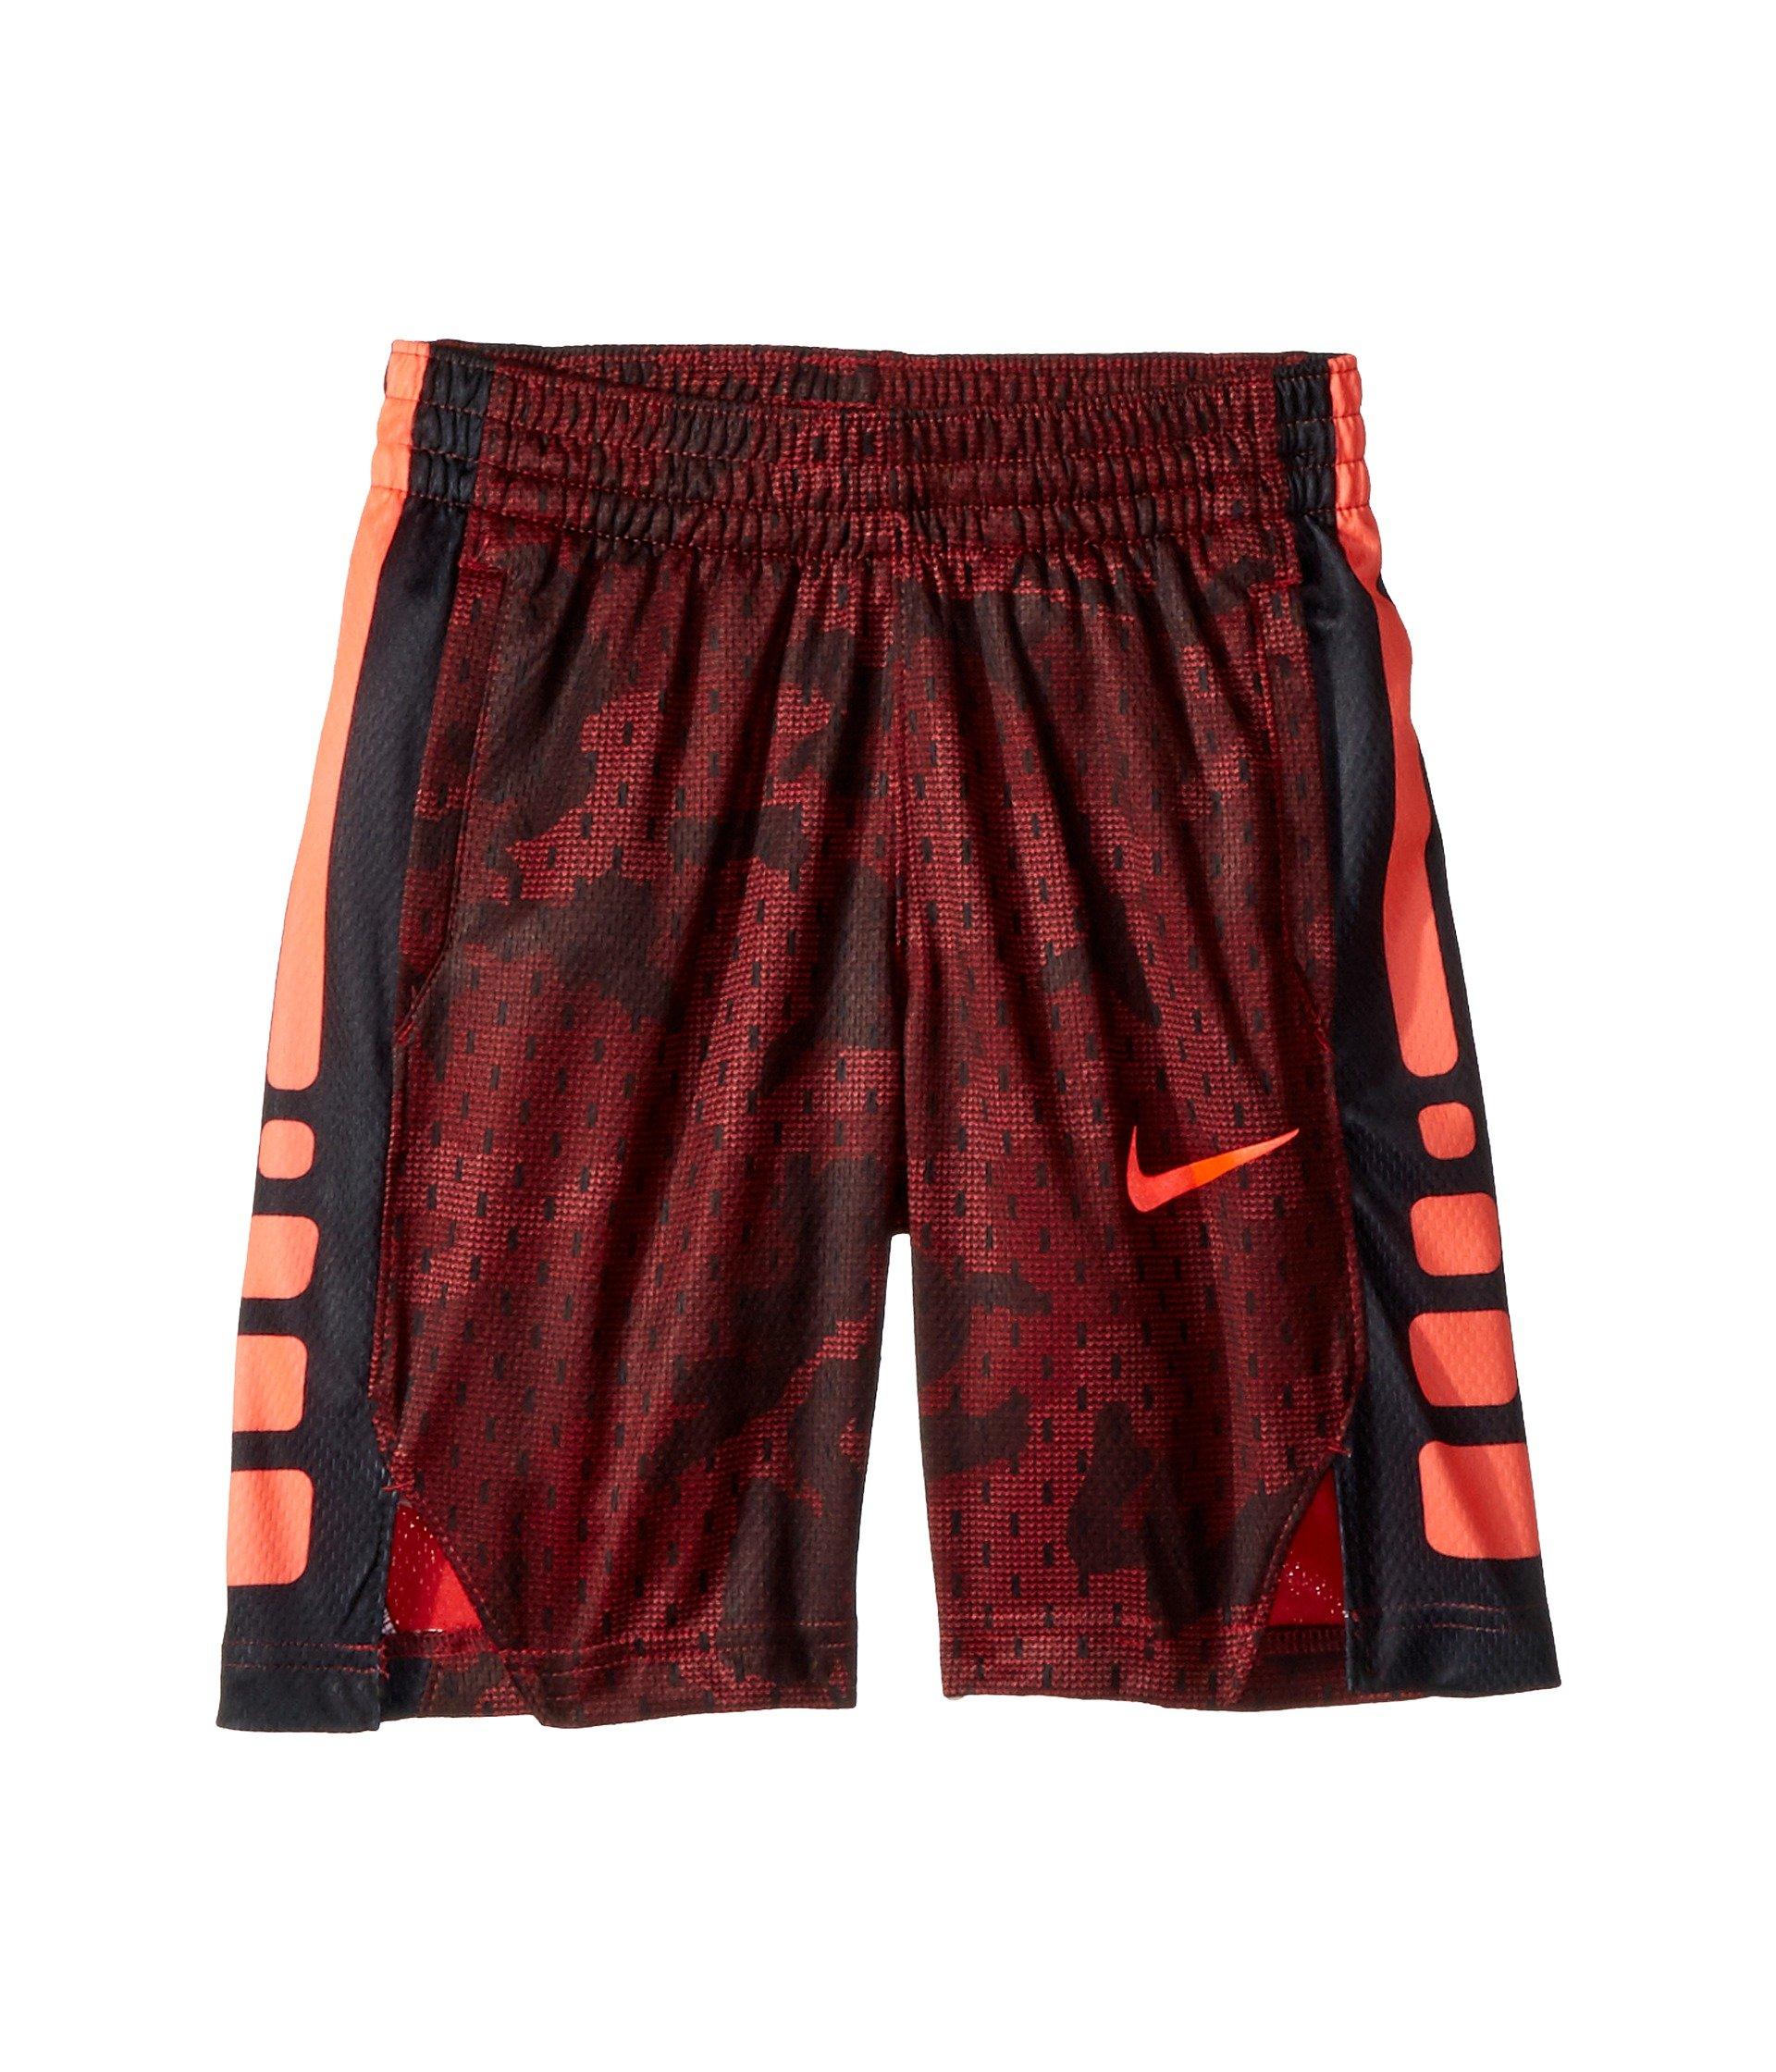 NIKE Boy's Dry Elite Camo Print Basketball Shorts (Red Crush/Black, X-Small)